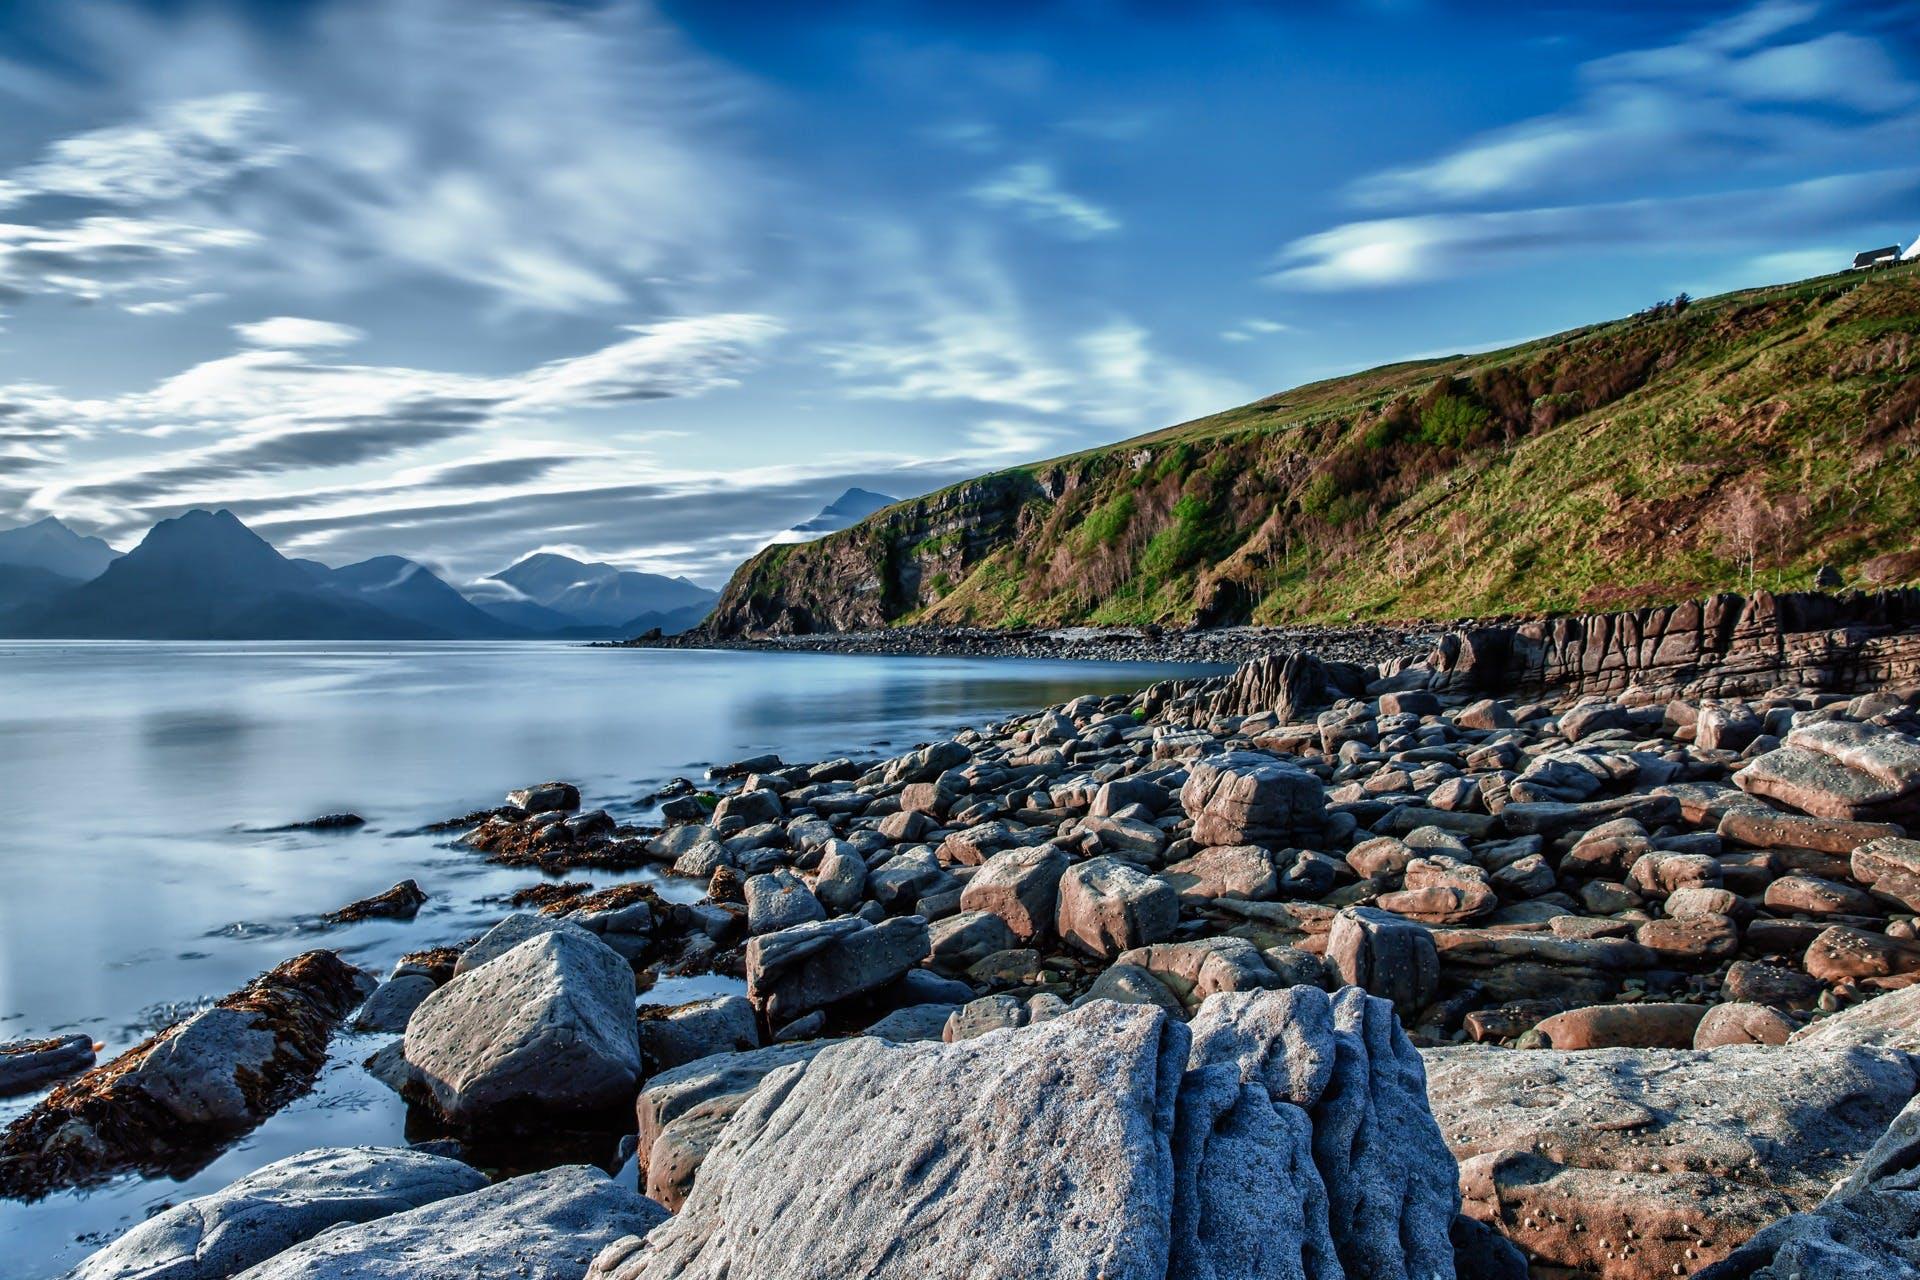 Big Rocks Near Ocean Under Blue Sky